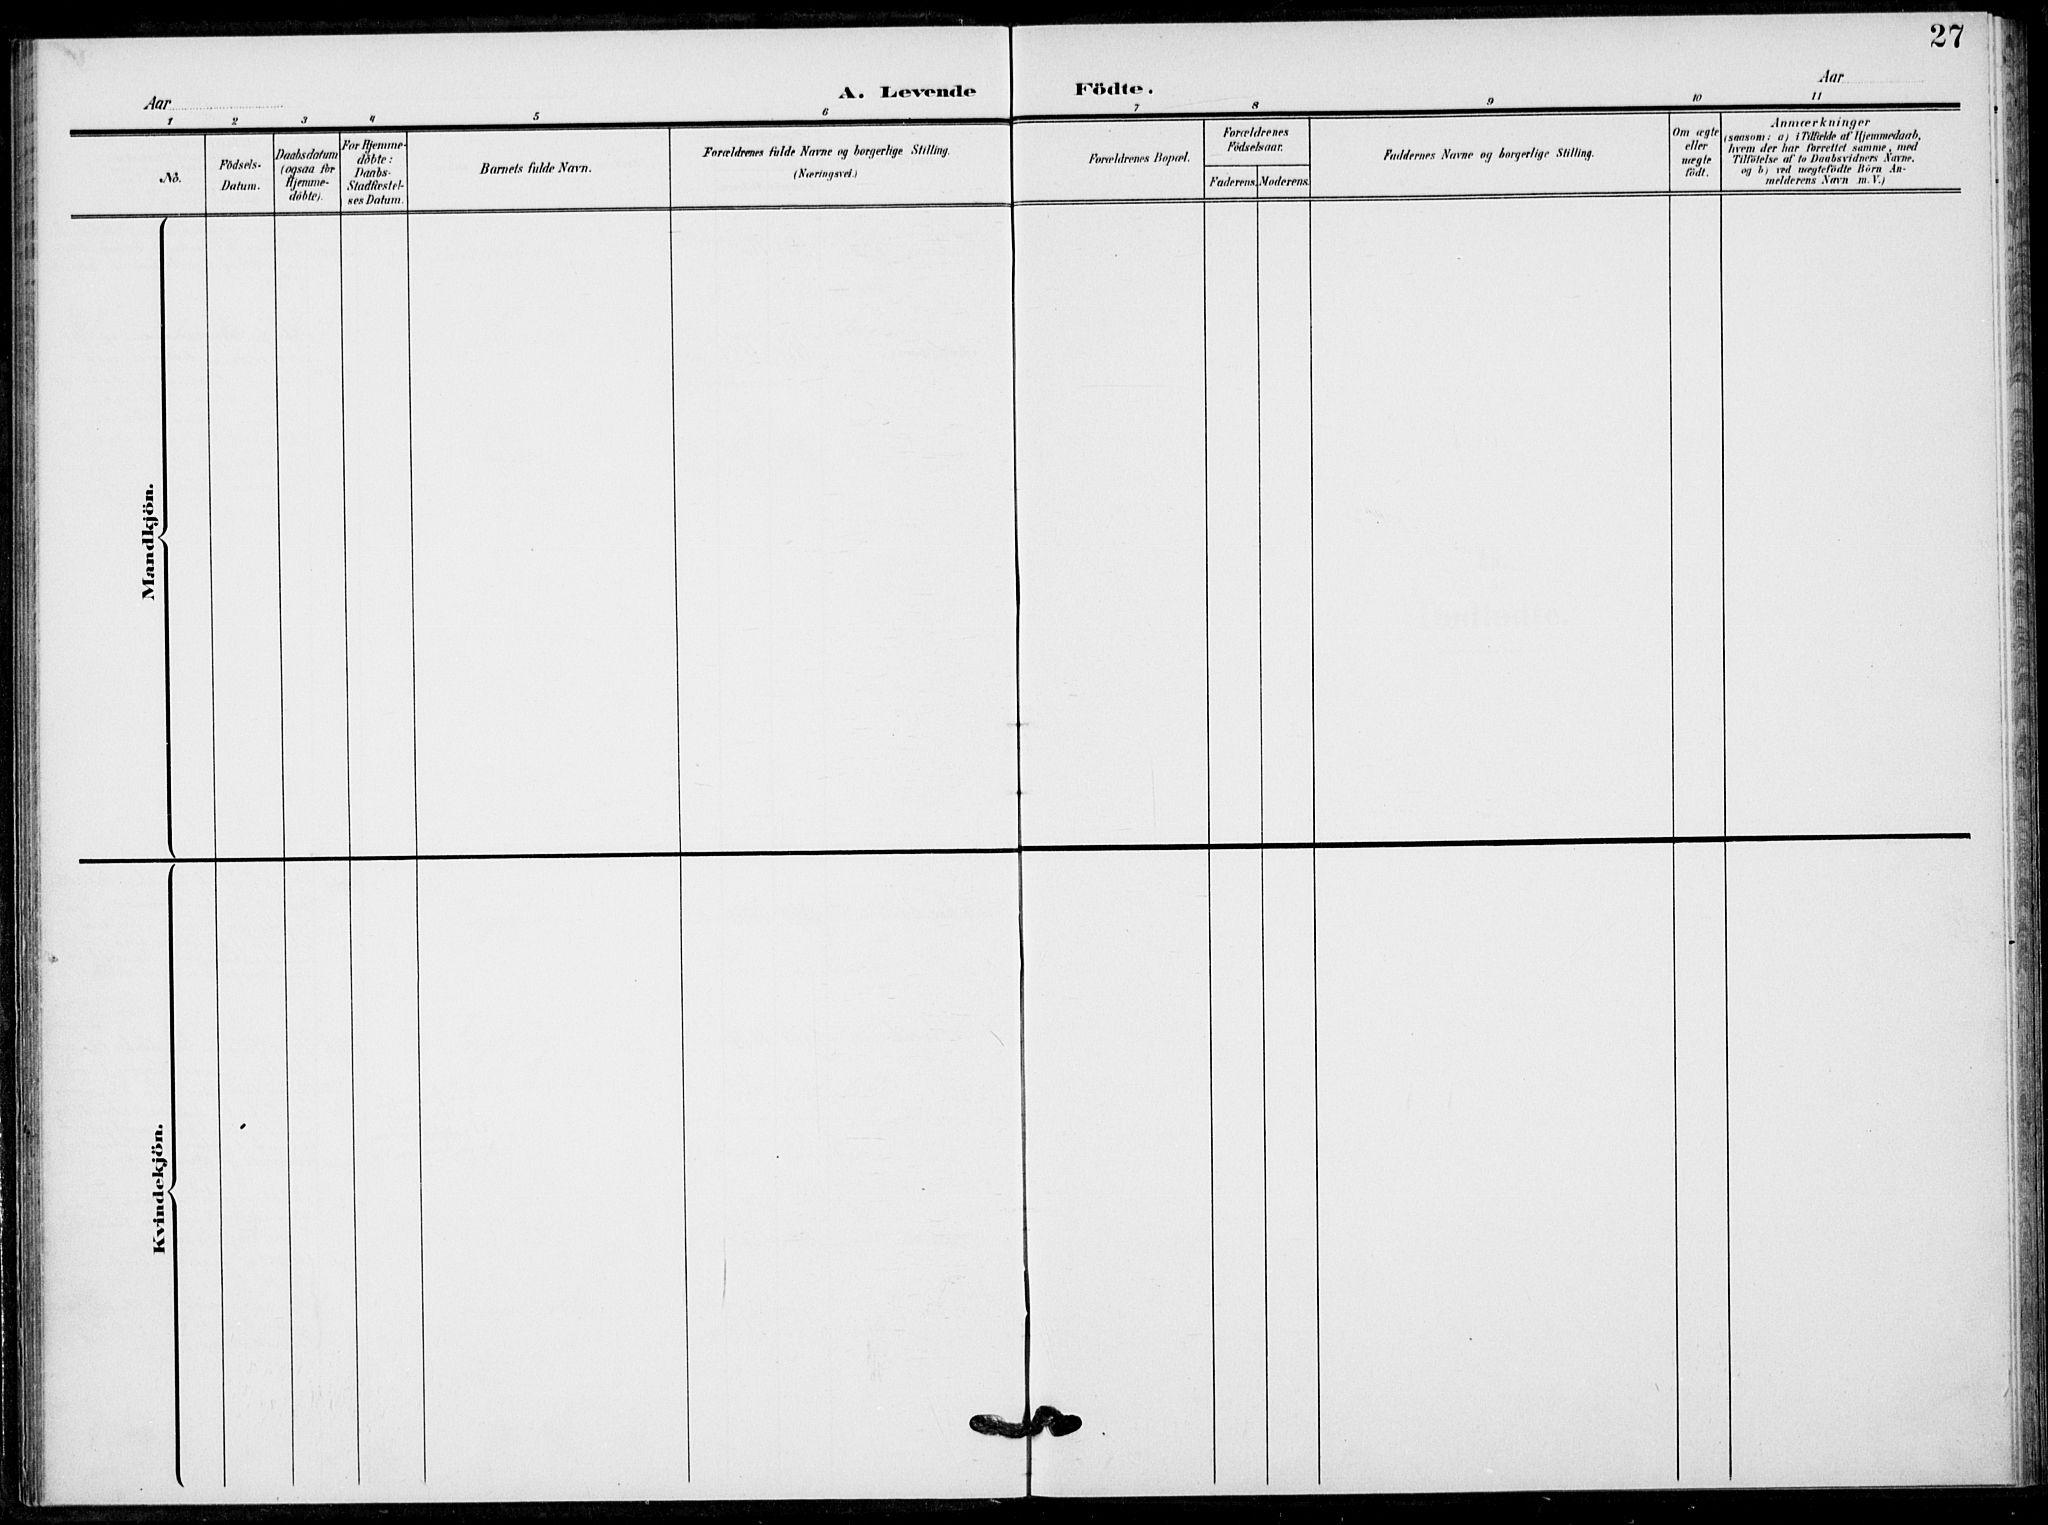 SAKO, Fyresdal kirkebøker, F/Fb/L0004: Ministerialbok nr. II 4, 1903-1920, s. 27